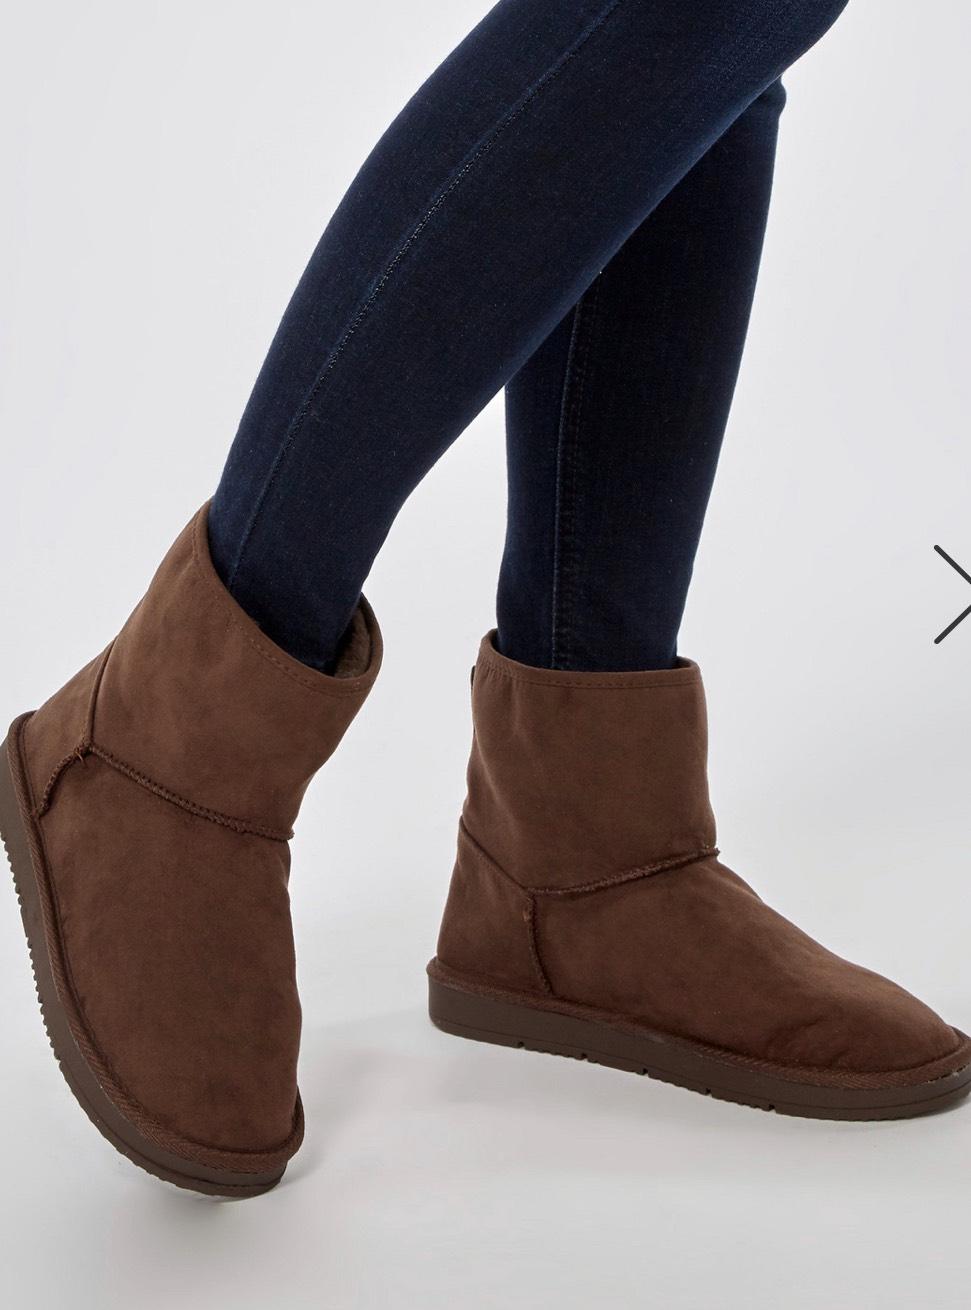 Chocolate 'Minty' Fur Boots £7.20(w/code)  free c+c @ Dorothy Perkins